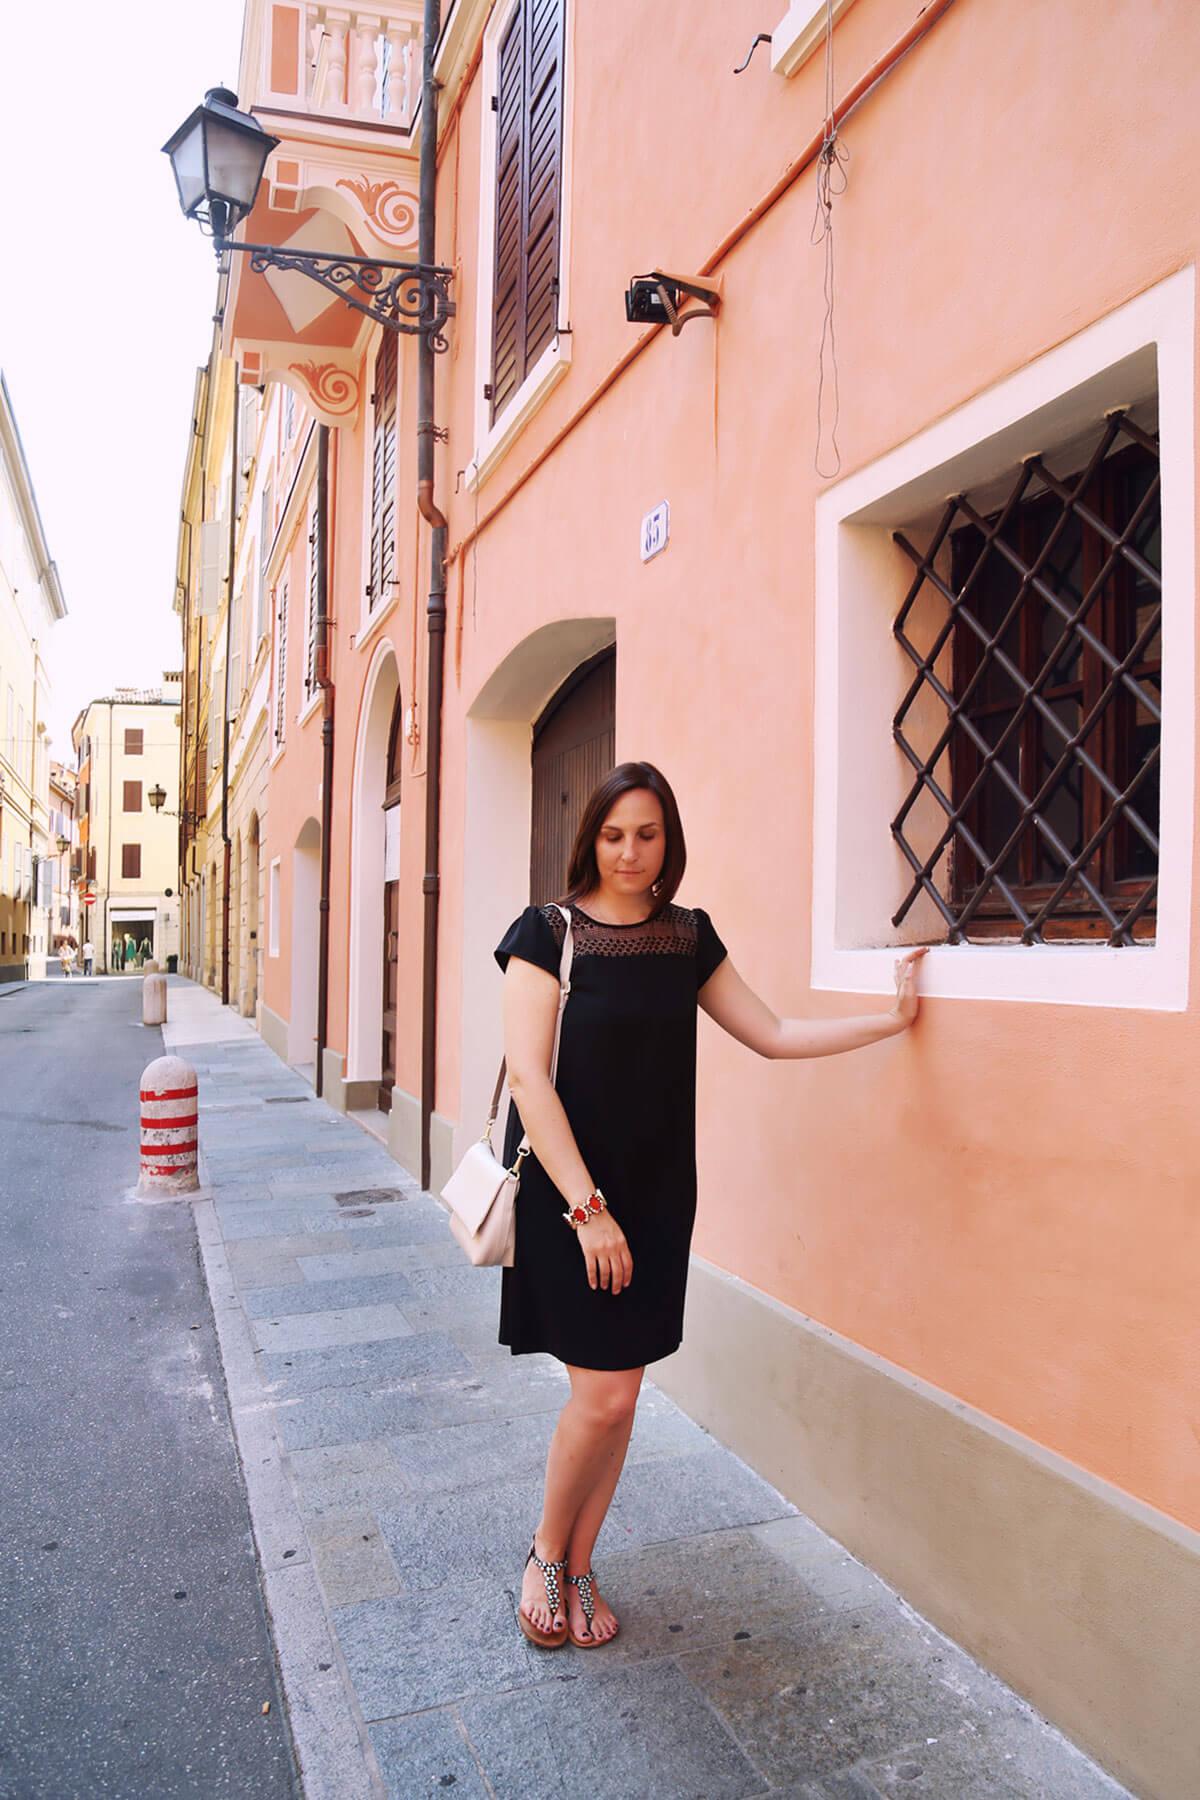 Relax e Beauty a Modena | Stefania Fregni in giro per la città